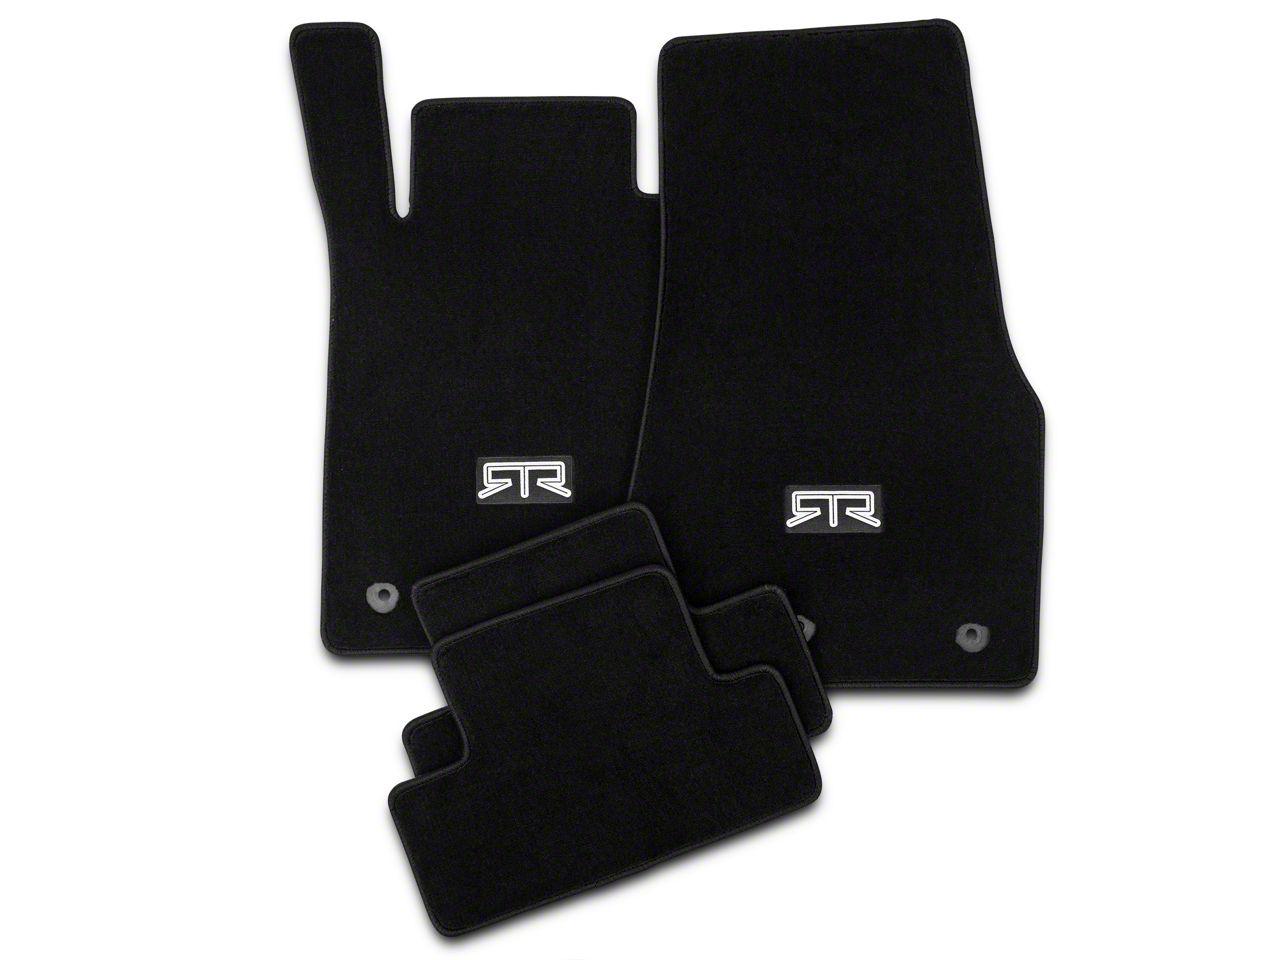 RTR Front & Rear Floor Mats w/ RTR Logo - Black (13-14 All)